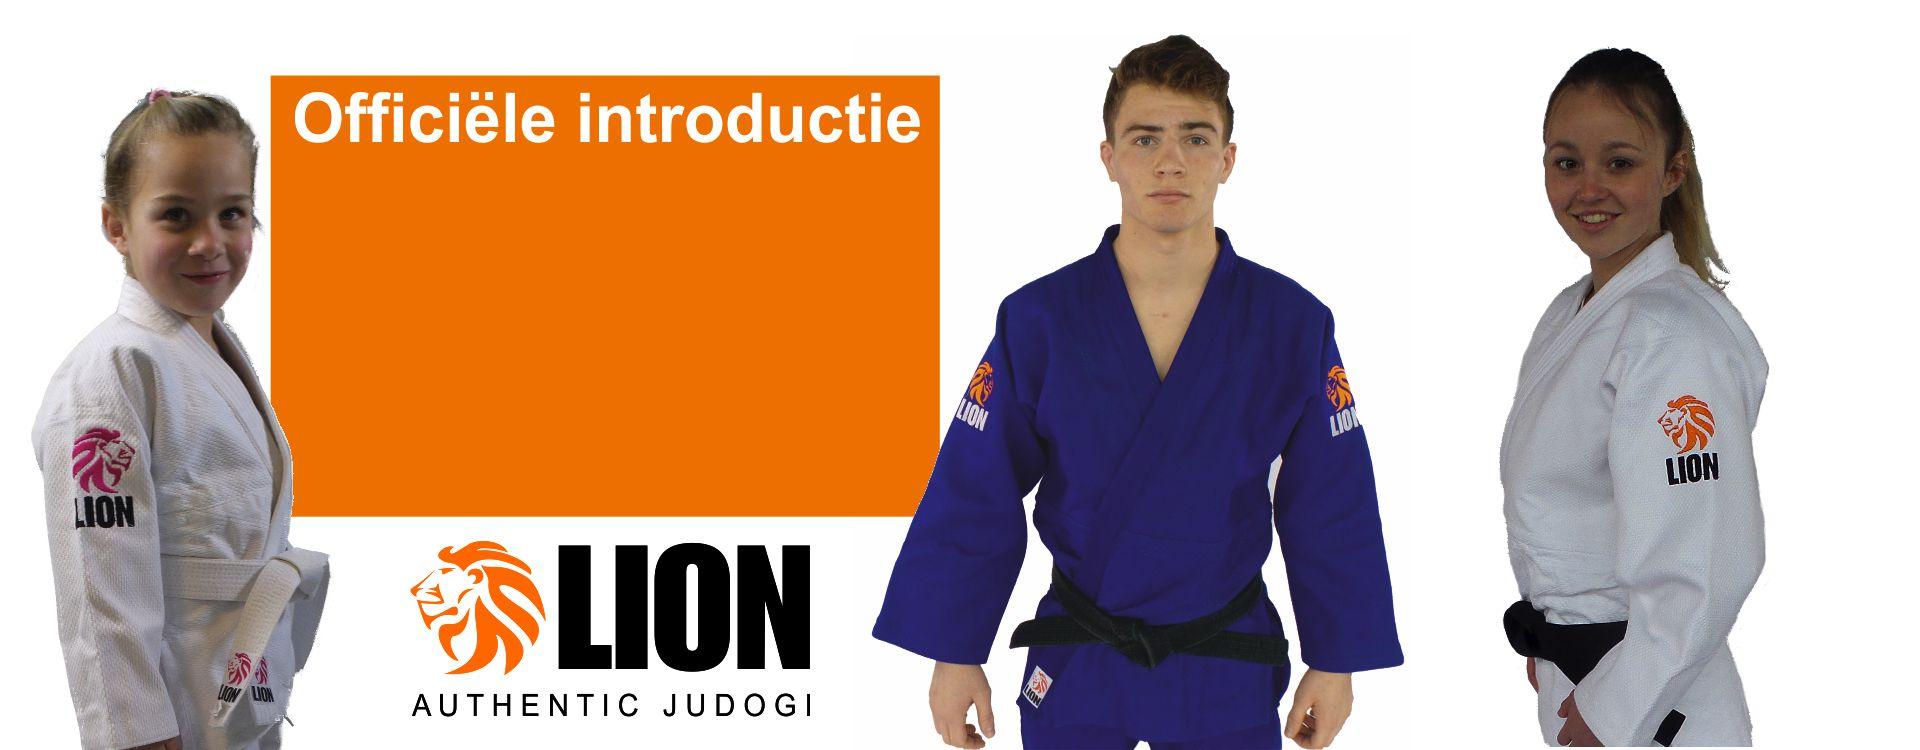 https://nieuwjudopak.nl/wp-content/uploads/2017/03/shop-home-gallery-banner-Lion-judogi-2017-judogi-collectie.jpg